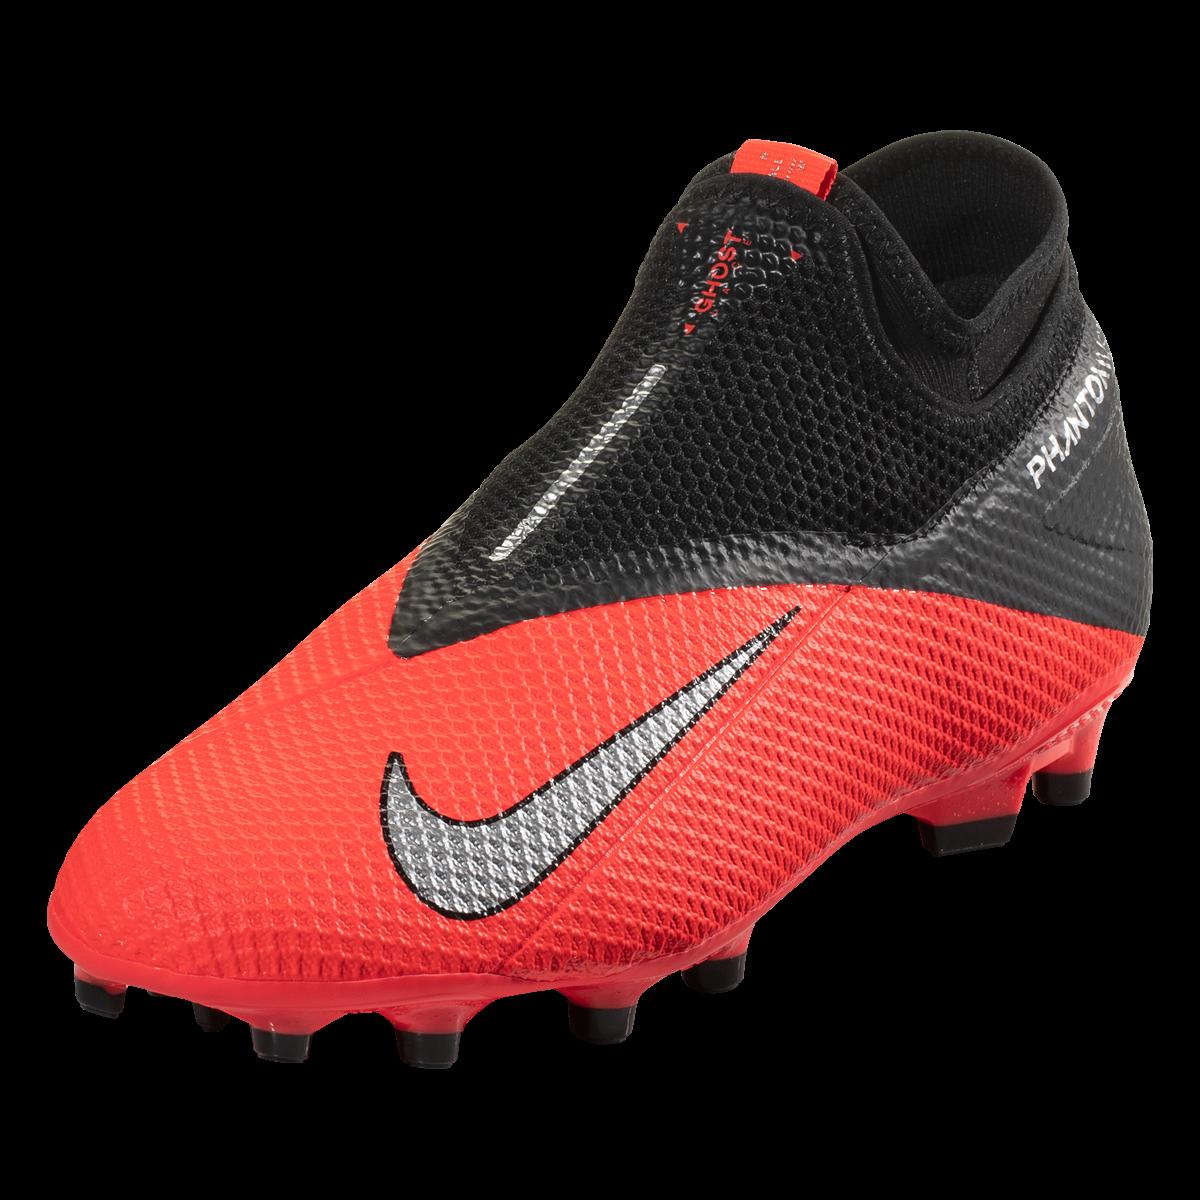 Nike Phantom Vision 2 Academy Df Fg Mg Firm Ground Soccer Cleat Laser Crimson Metallic Silver Black 8 In 2020 Soccer Cleats Phantom Vision Cleats